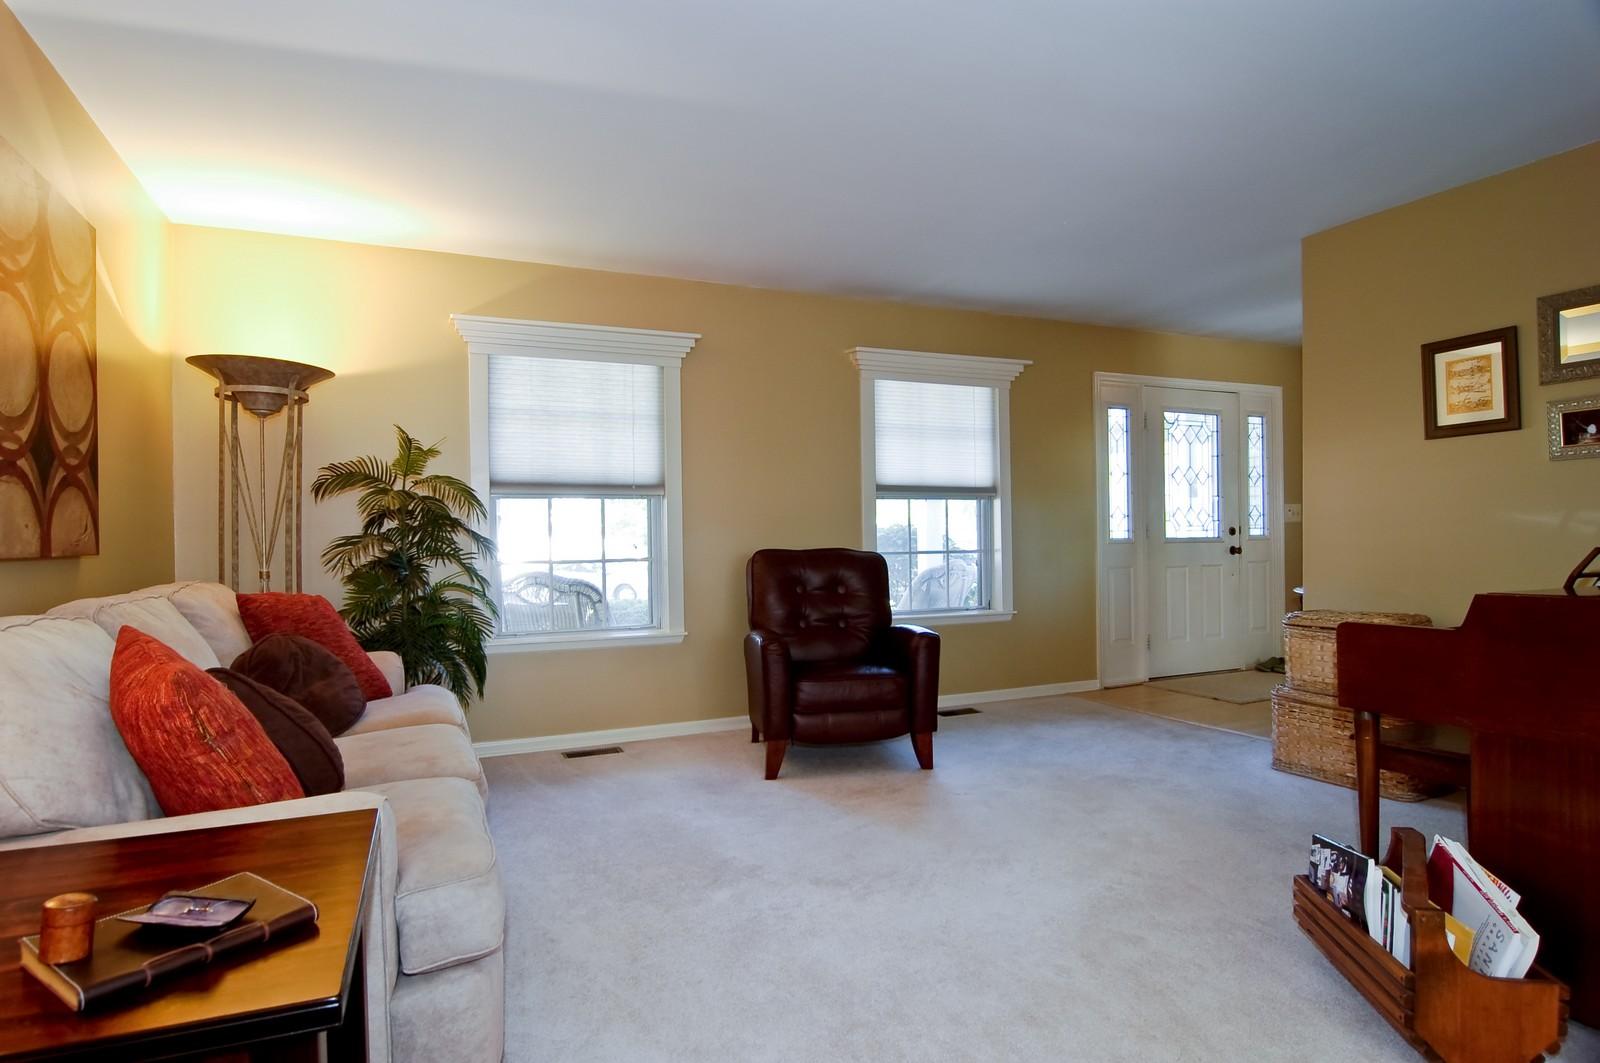 Real Estate Photography - 315 Kensington, Streamwood, IL, 60107 - Living Room